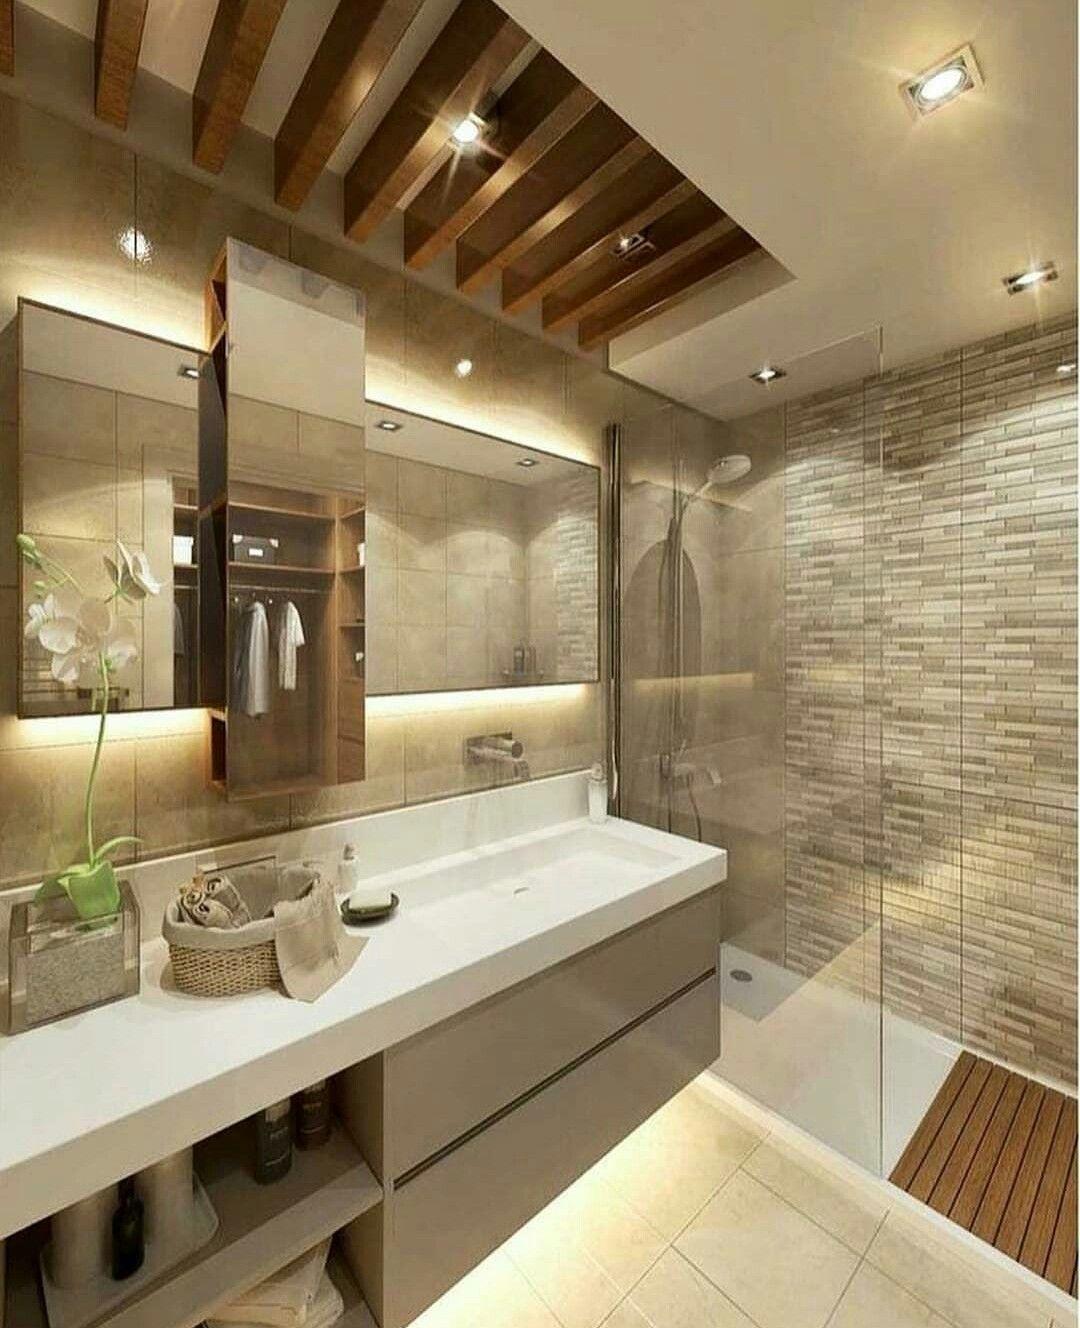 Interior design of bathroom pin by interior design on furniture in   pinterest  bathroom